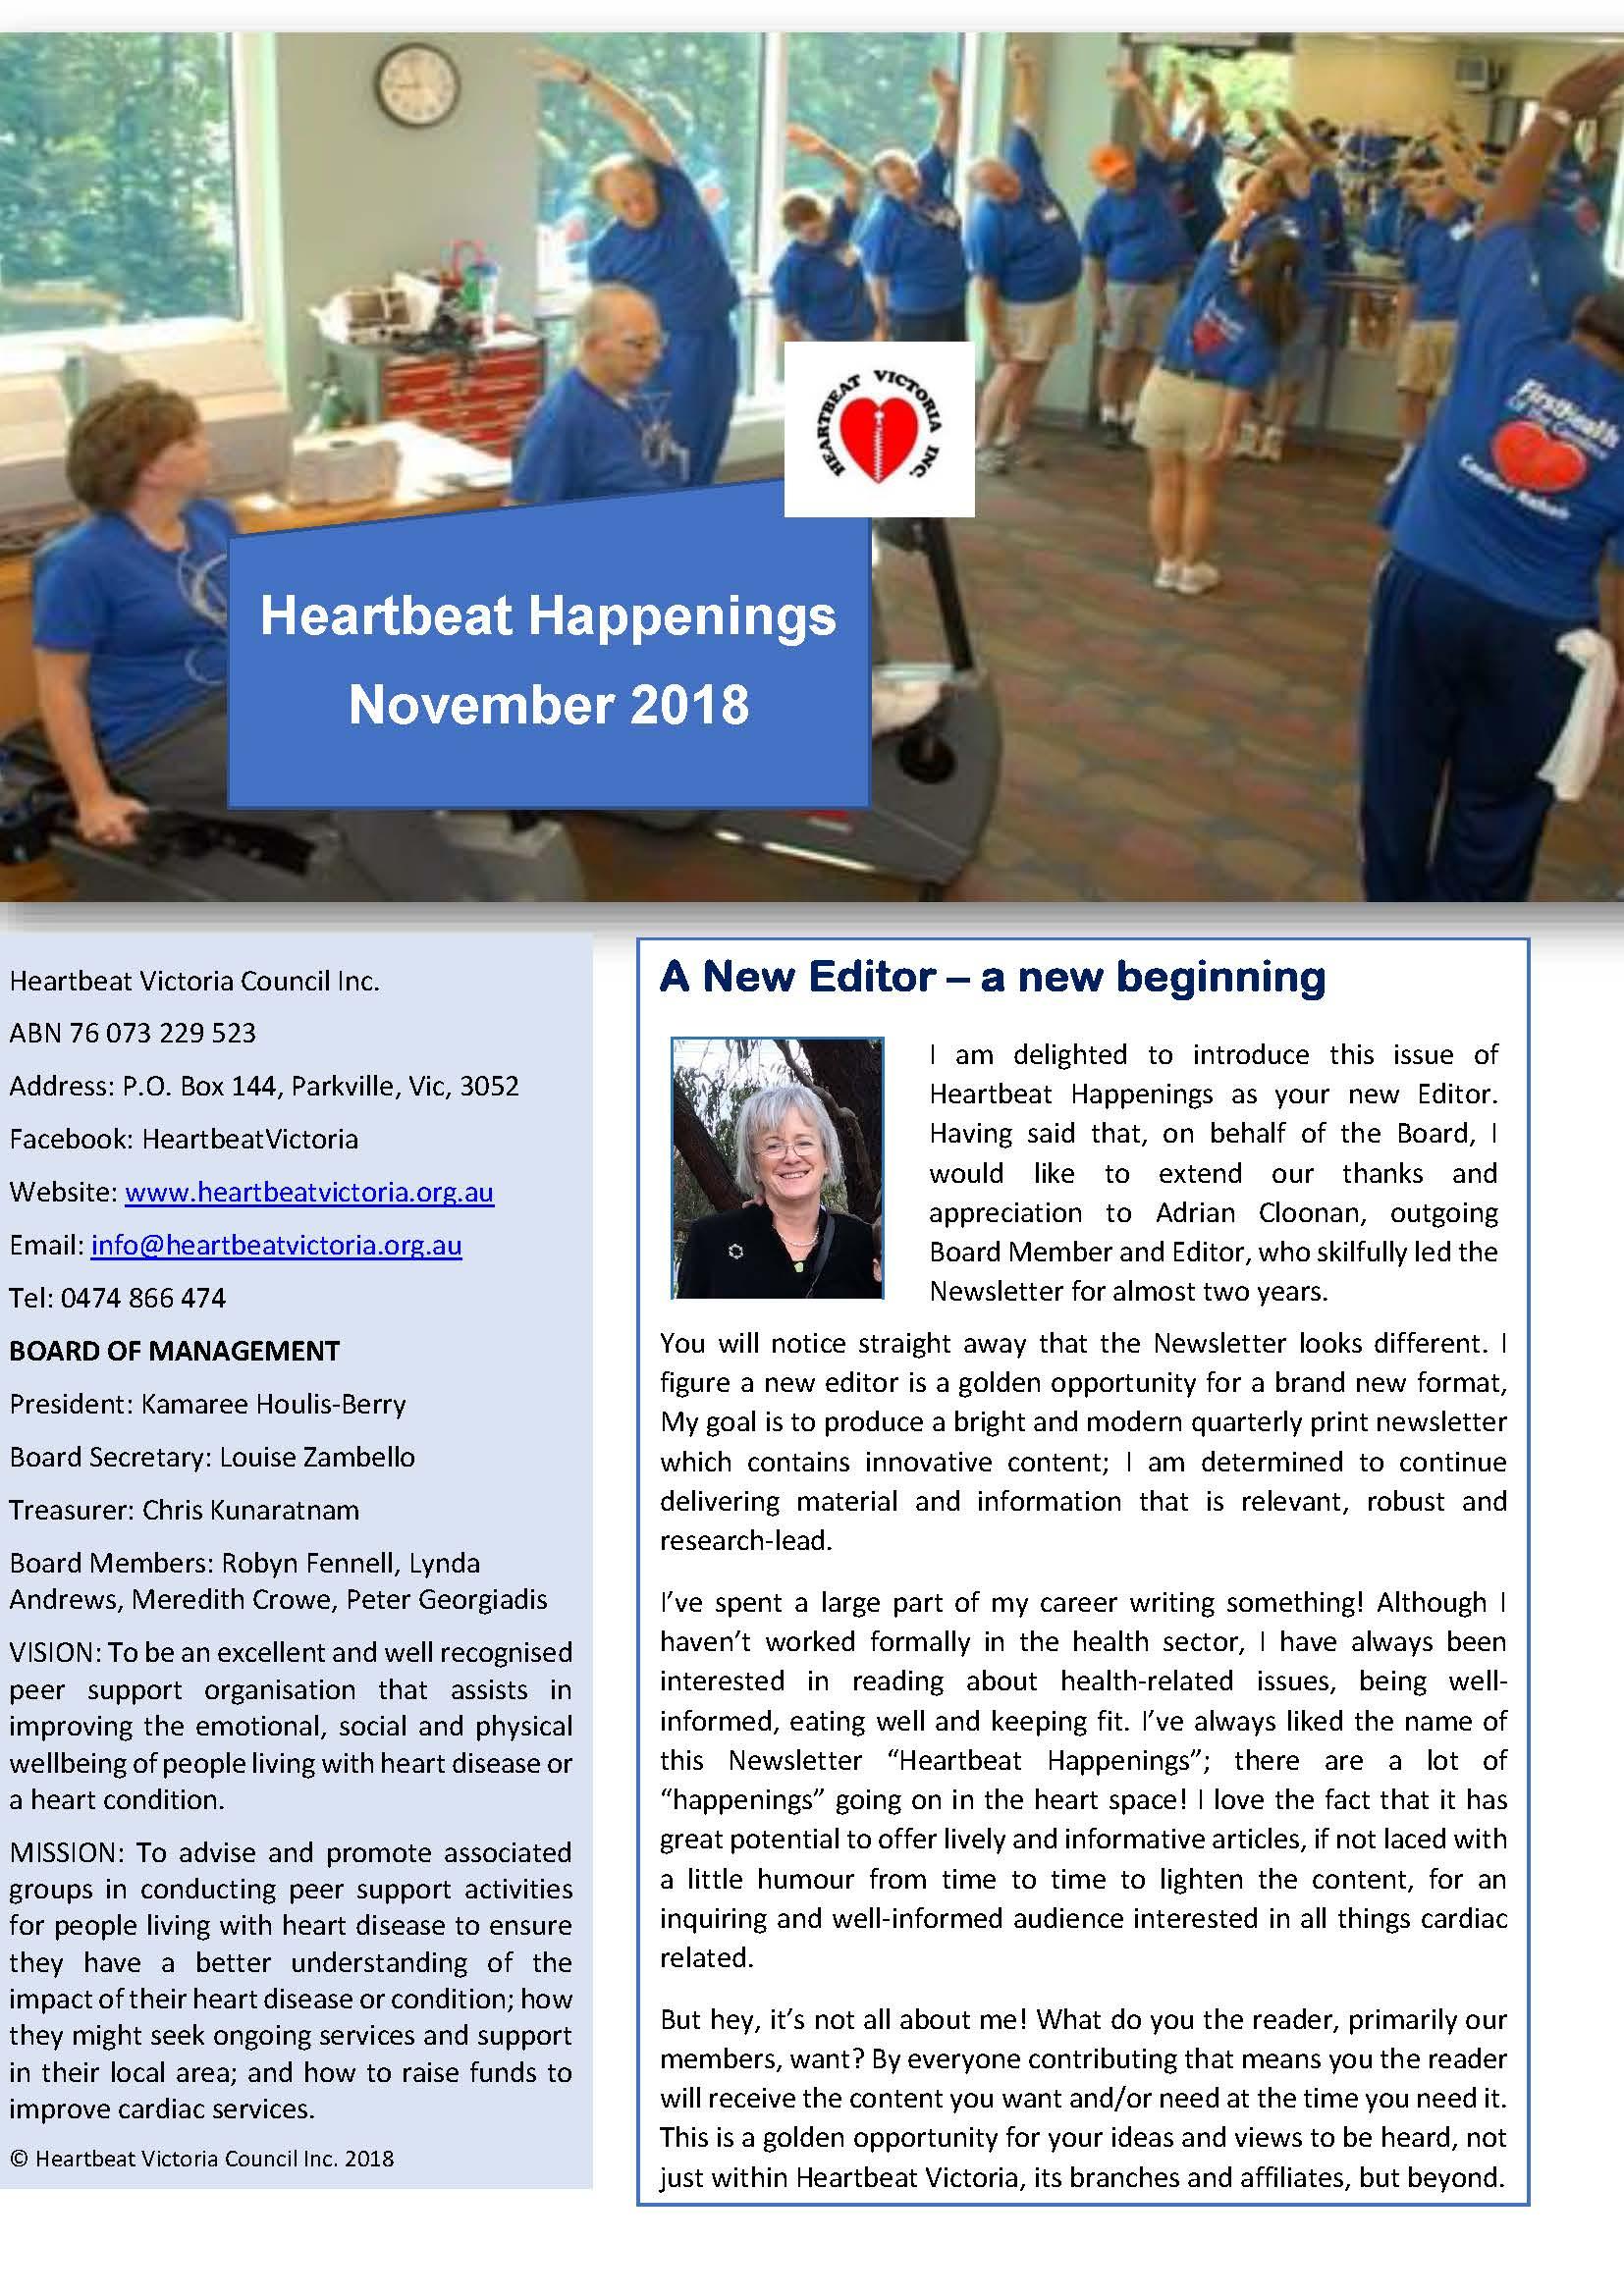 Heartbeat Happenings November 2018